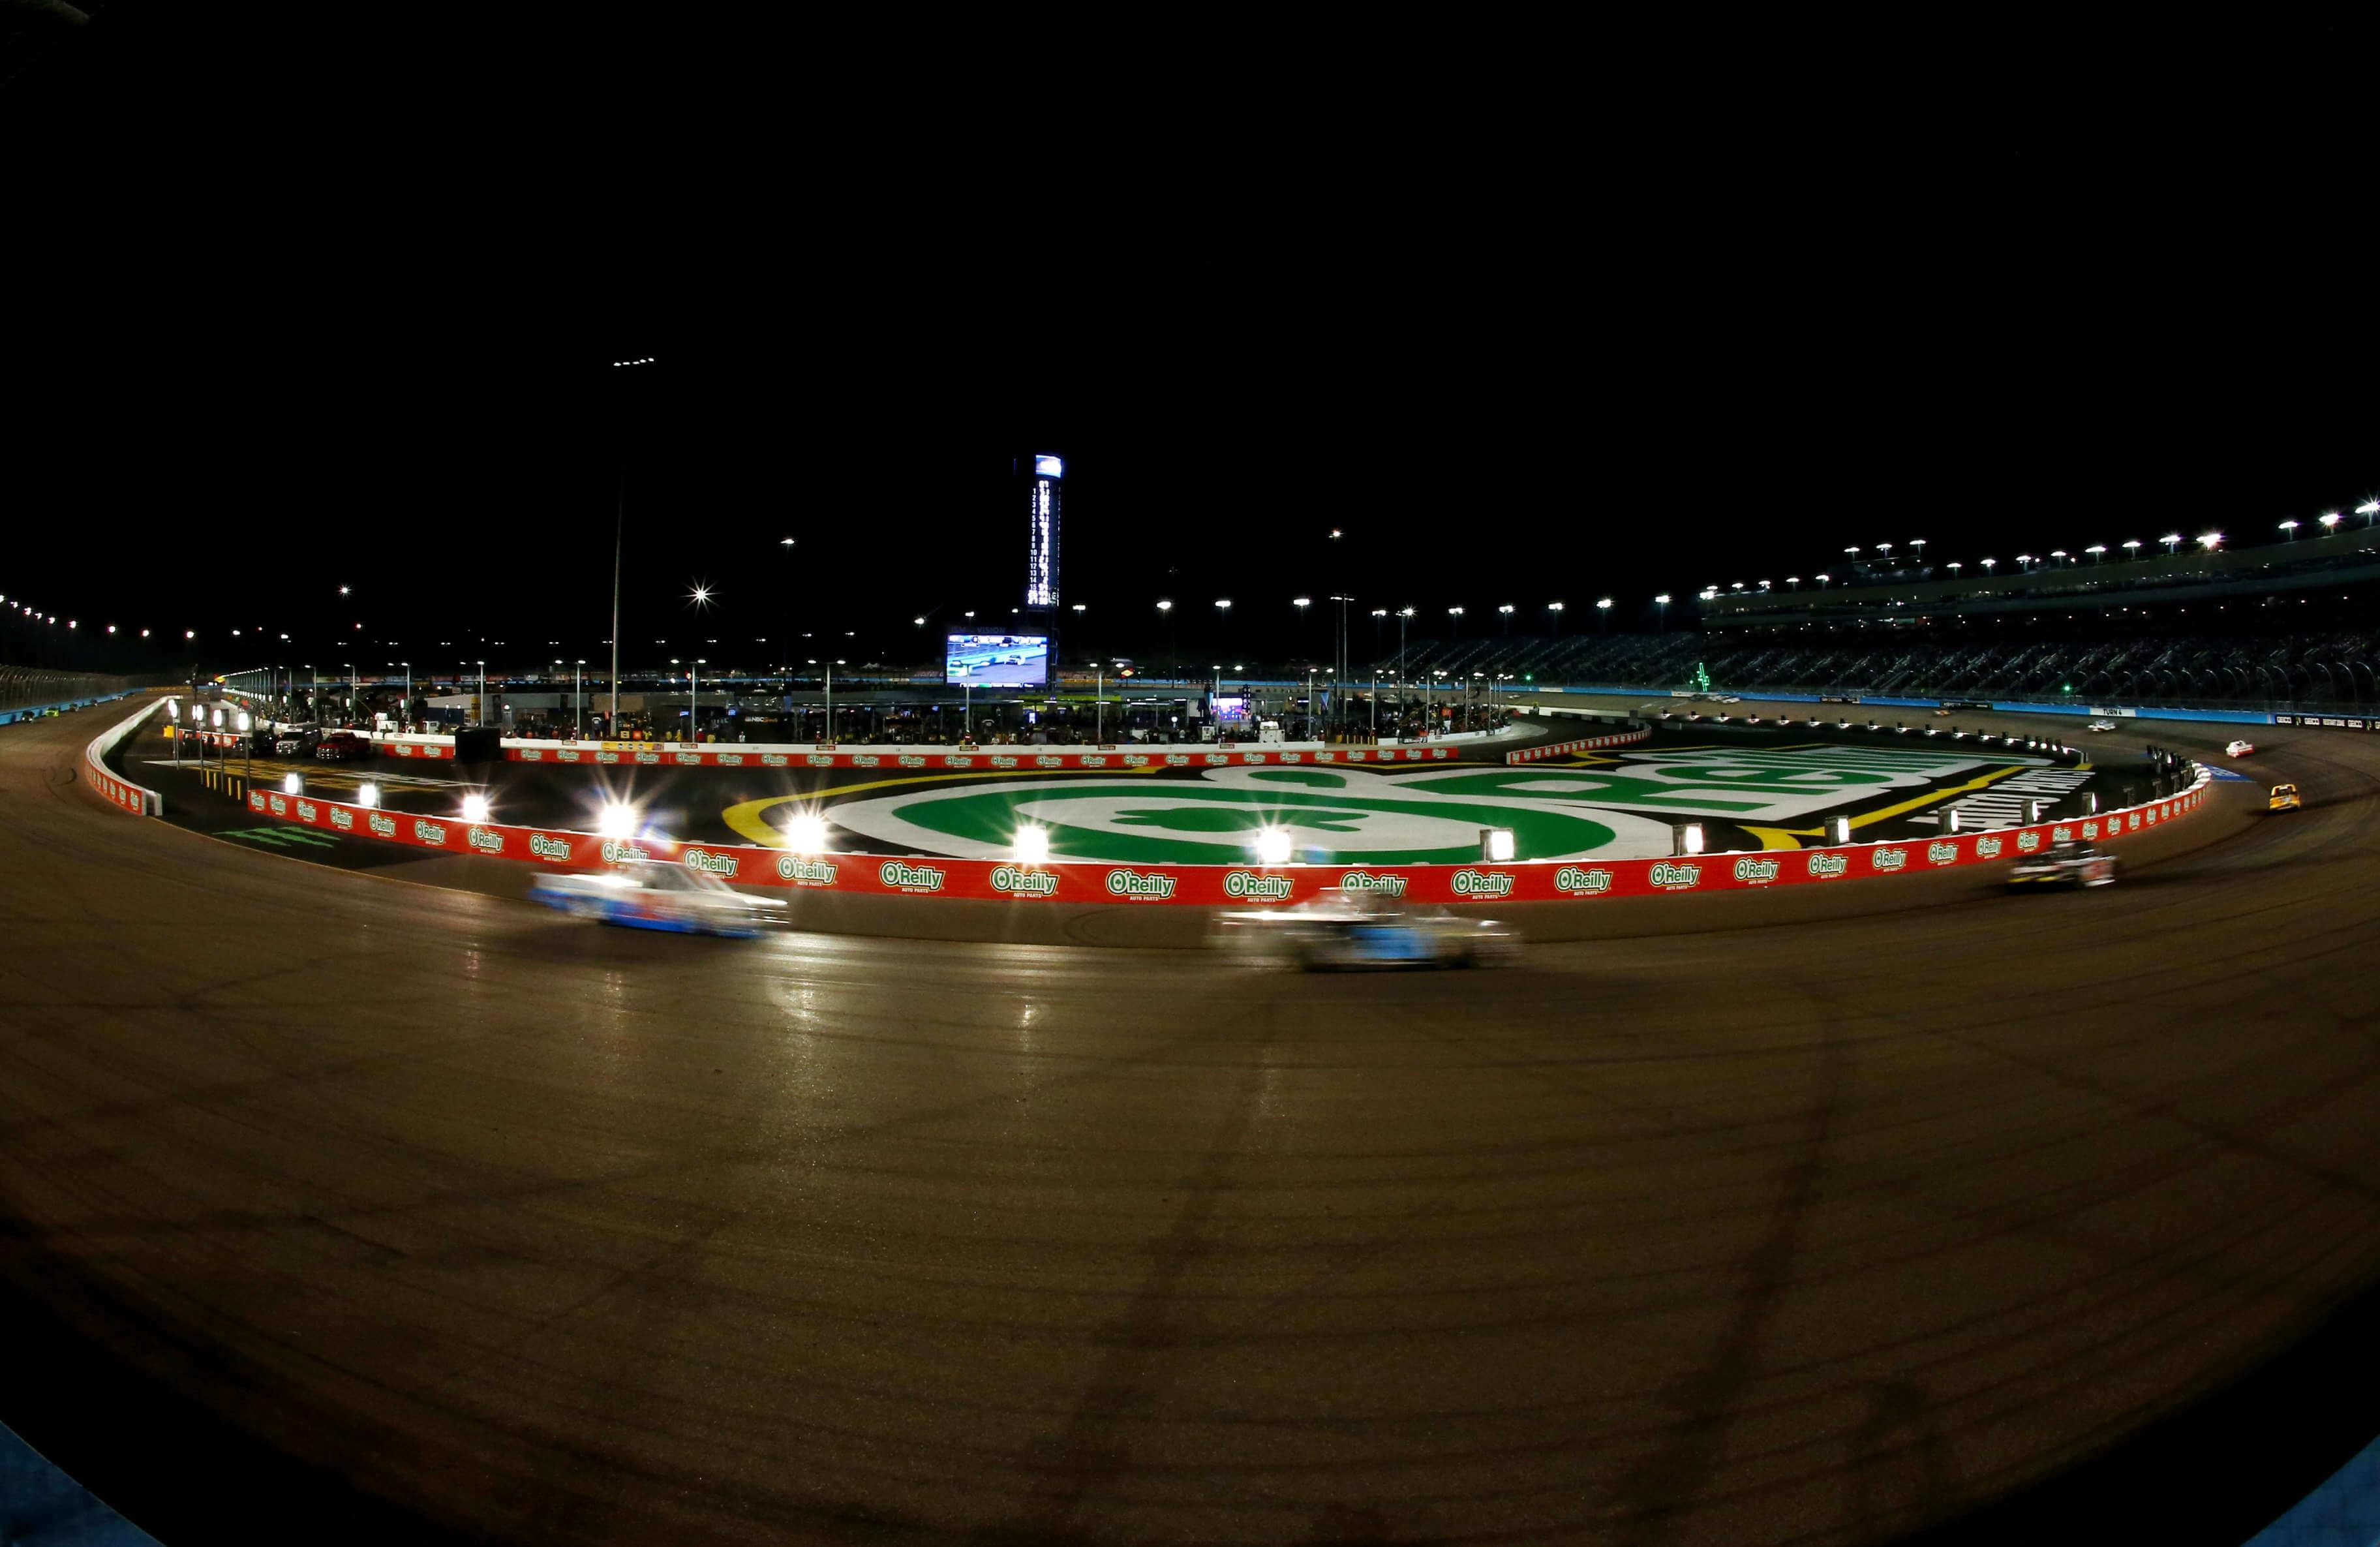 NASCAR Truck Series at ISM Raceway - Phoenix